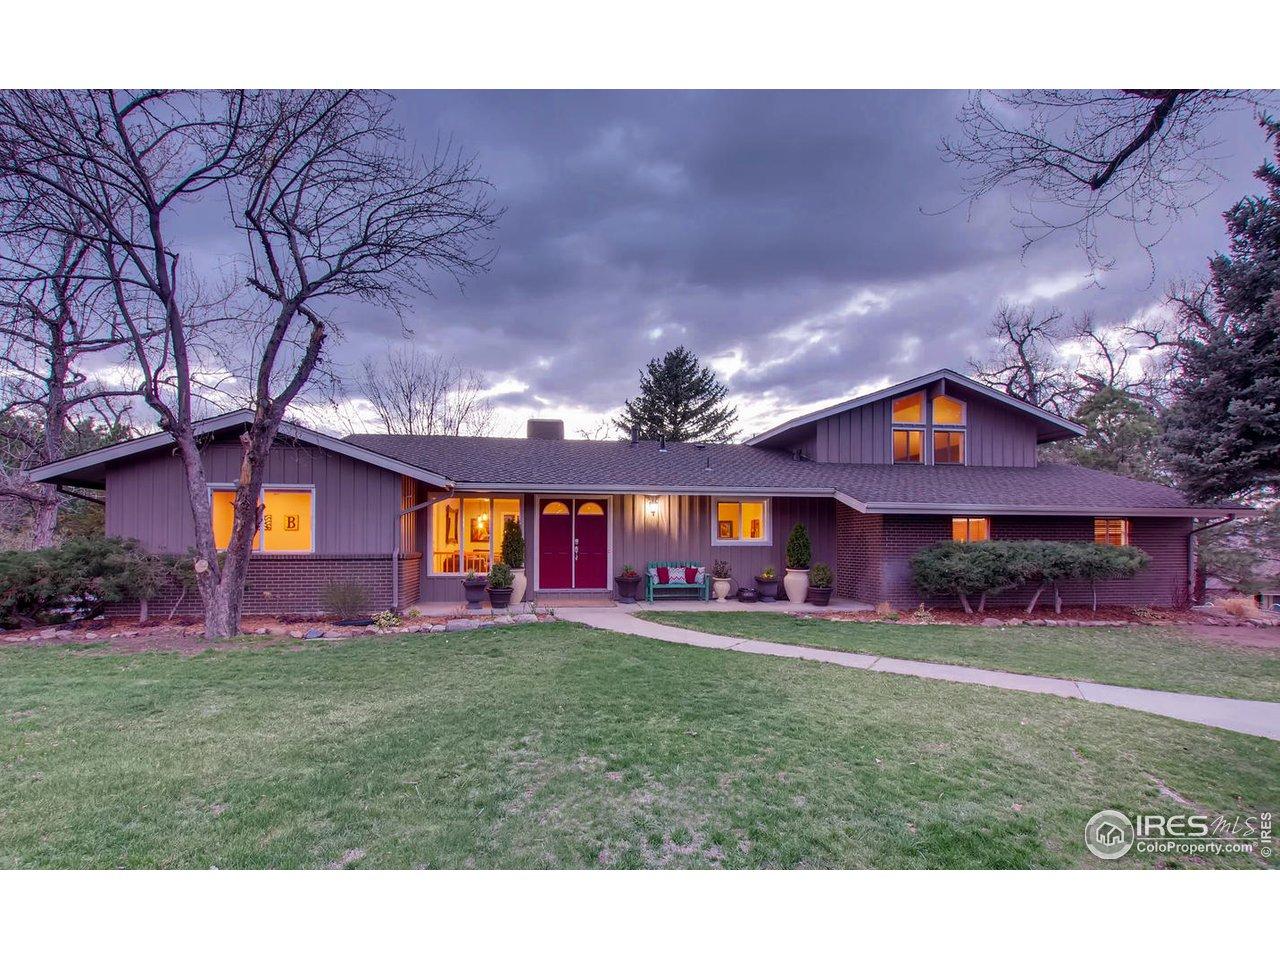 135 76th St, Boulder CO 80303